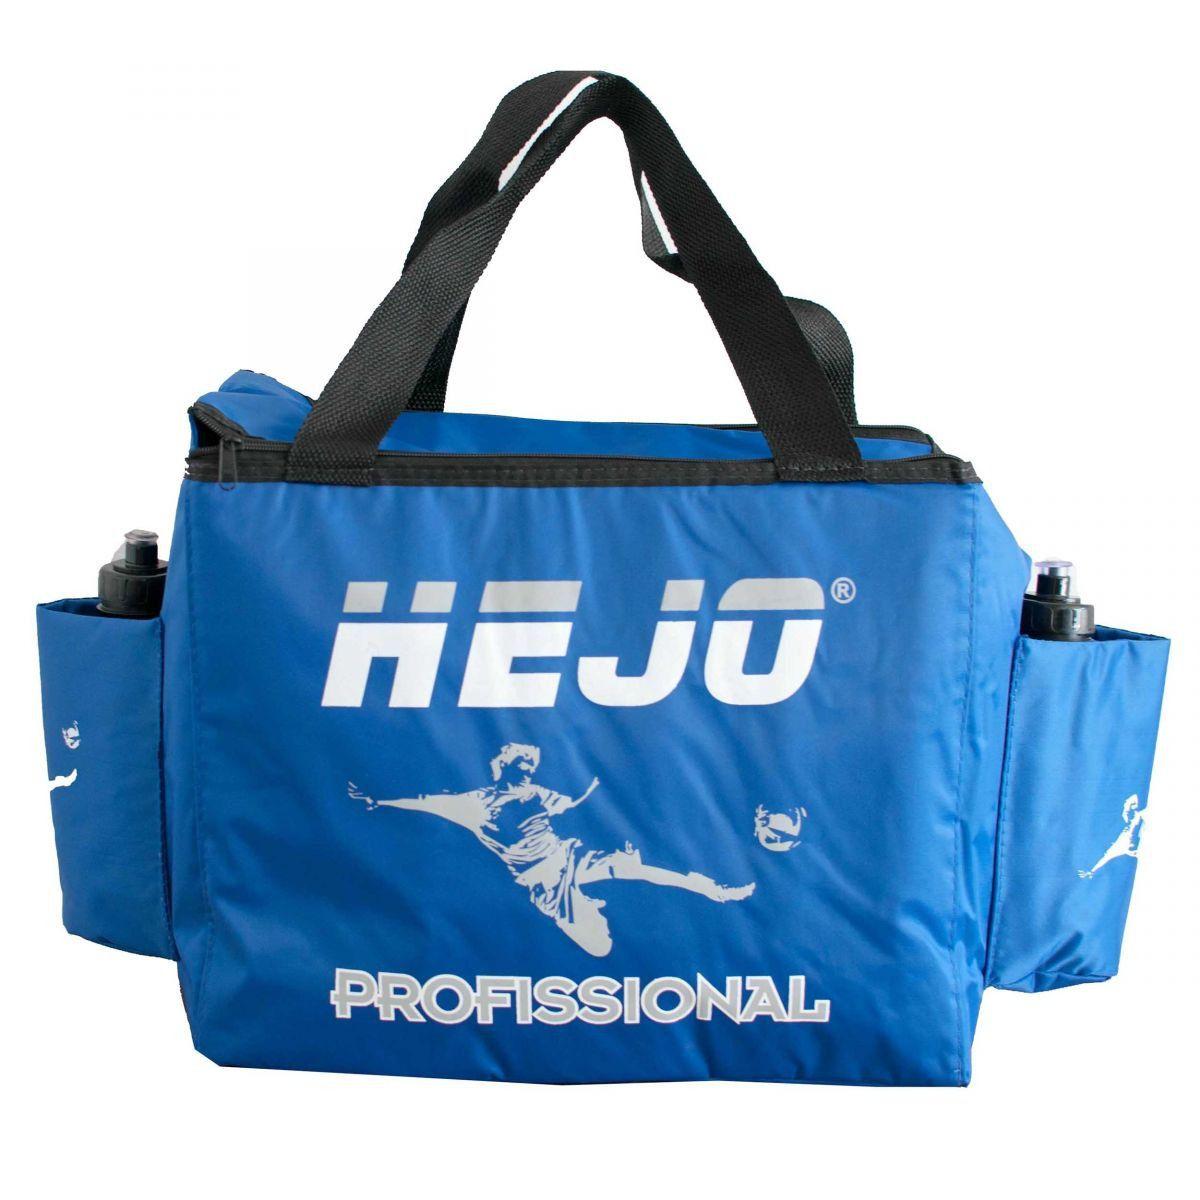 Bolsa Térmica Massagista Modelo Europa Futebol Profissional - Cor Azul Claro